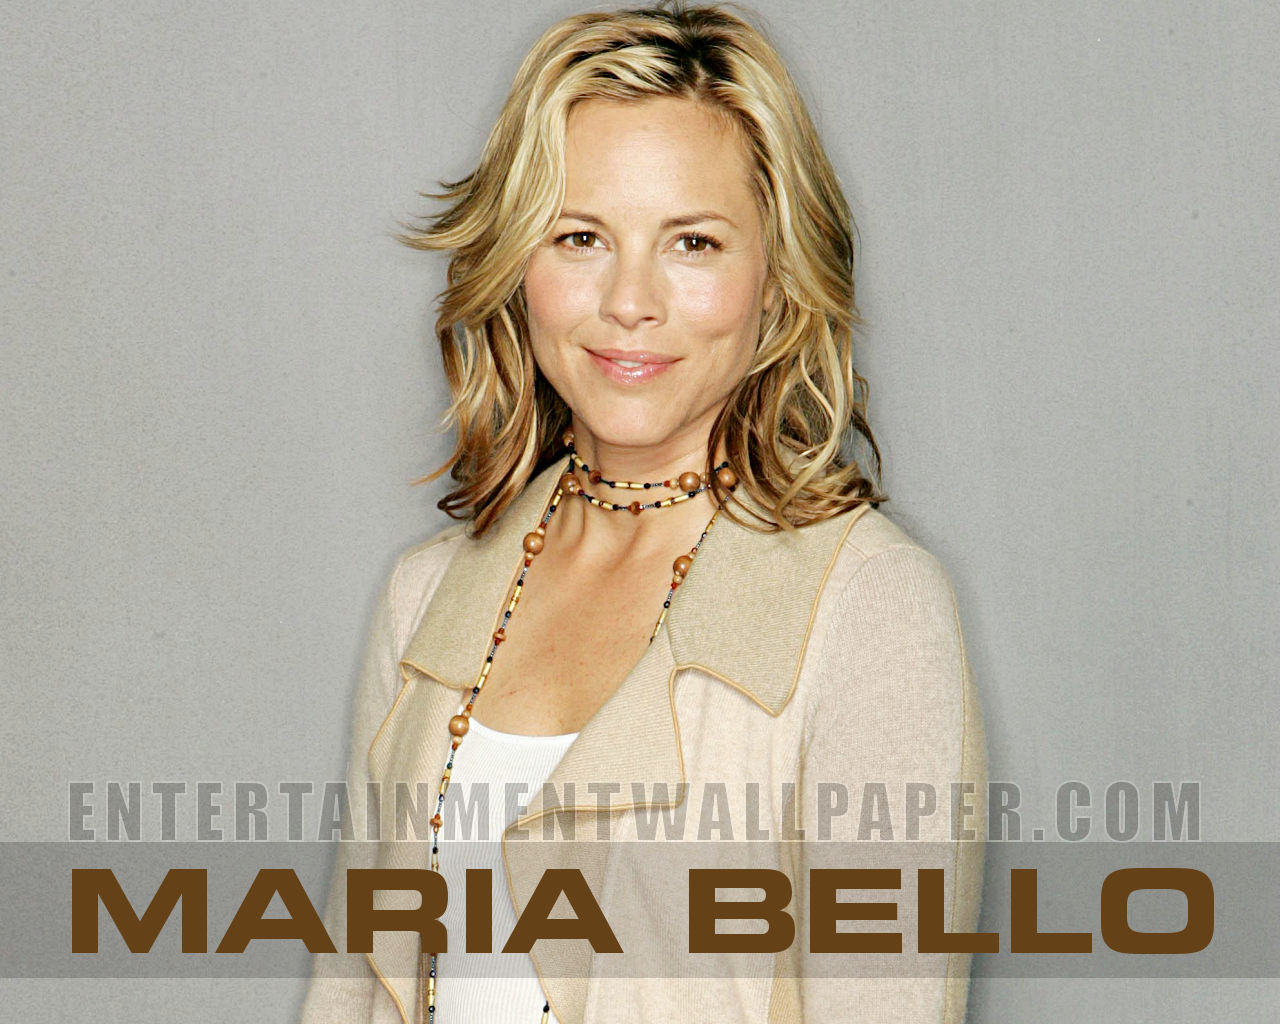 http://4.bp.blogspot.com/-h3d2DPXDaKE/TpENO5GKnsI/AAAAAAAAIC0/f1qP1GkIFZc/s1600/maria_bello06.jpg